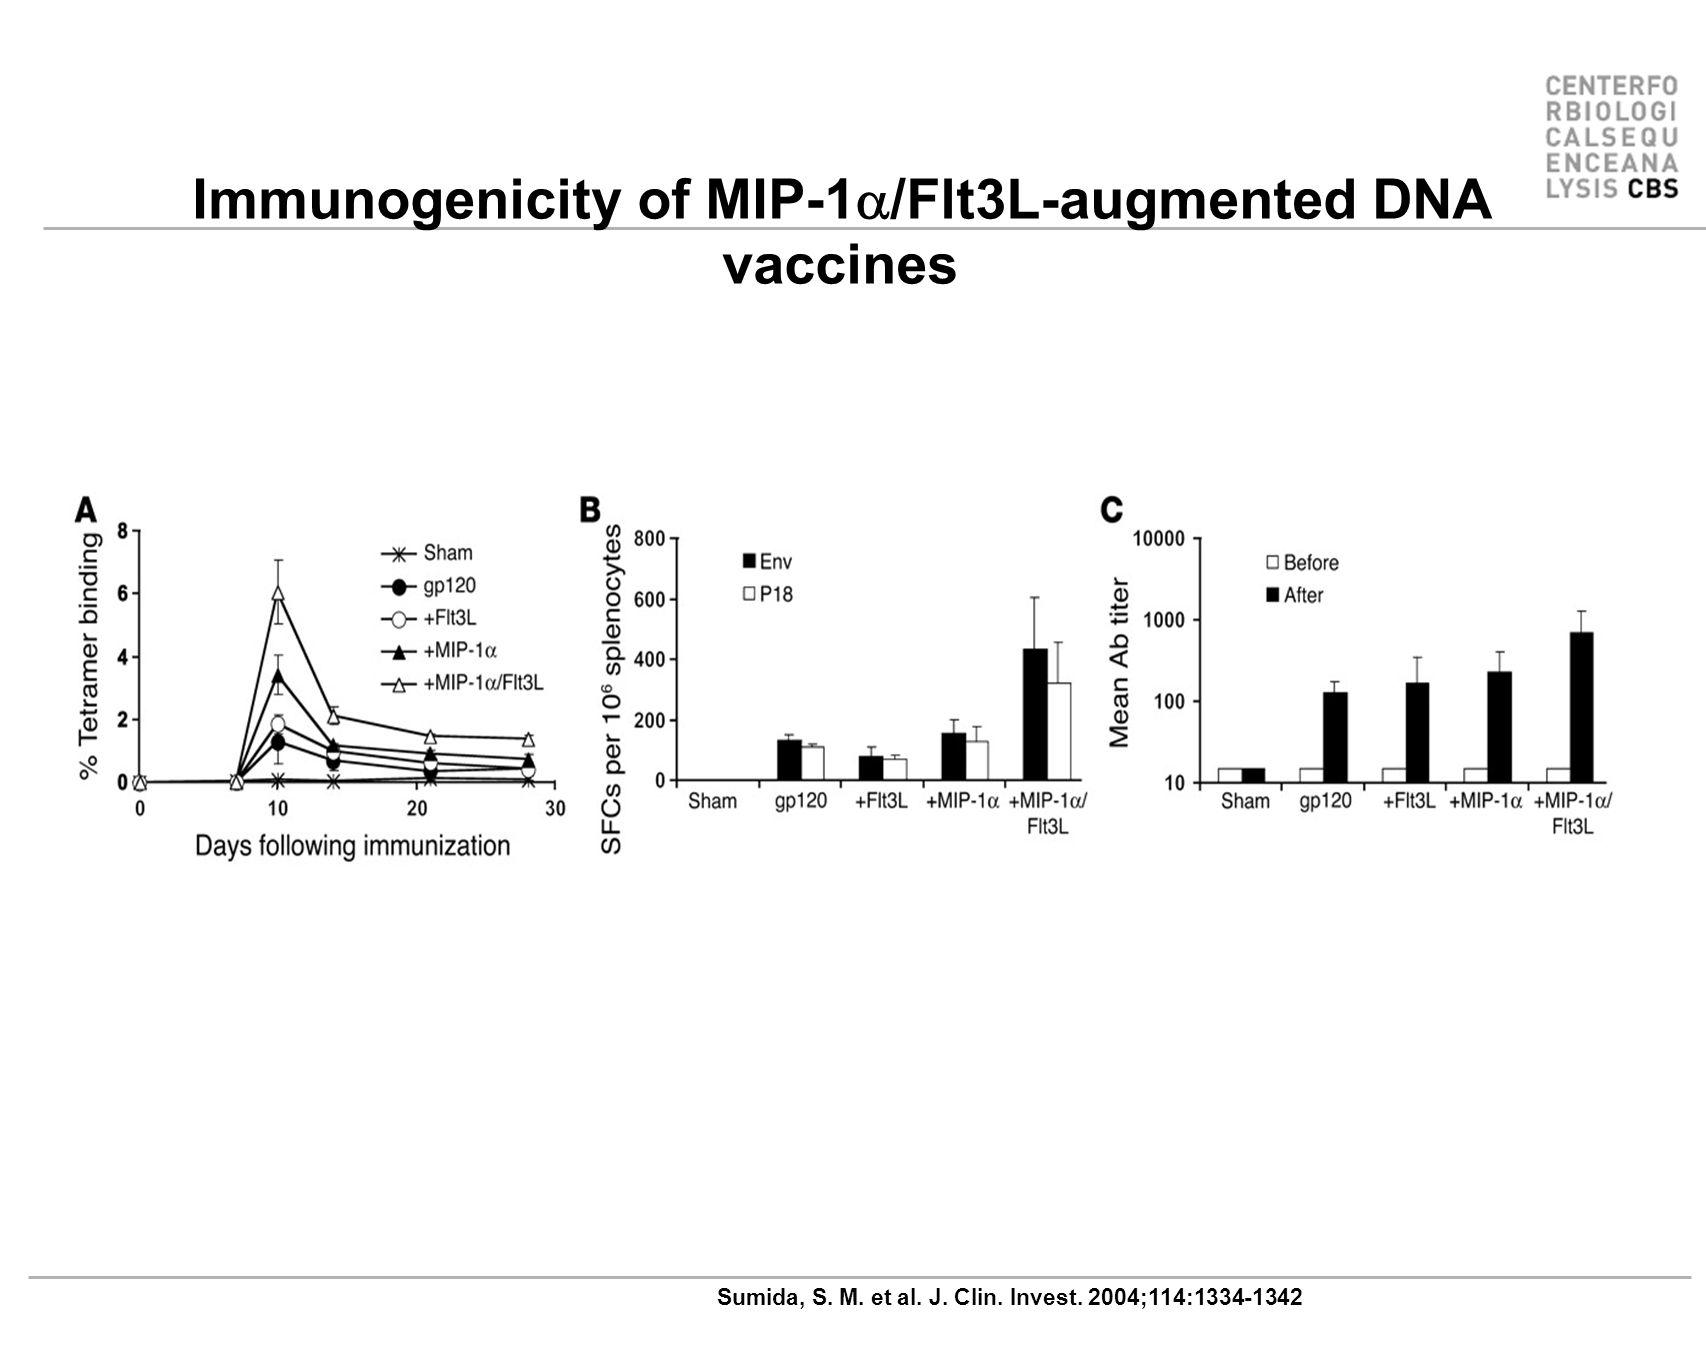 Immunogenicity of MIP-1a/Flt3L-augmented DNA vaccines